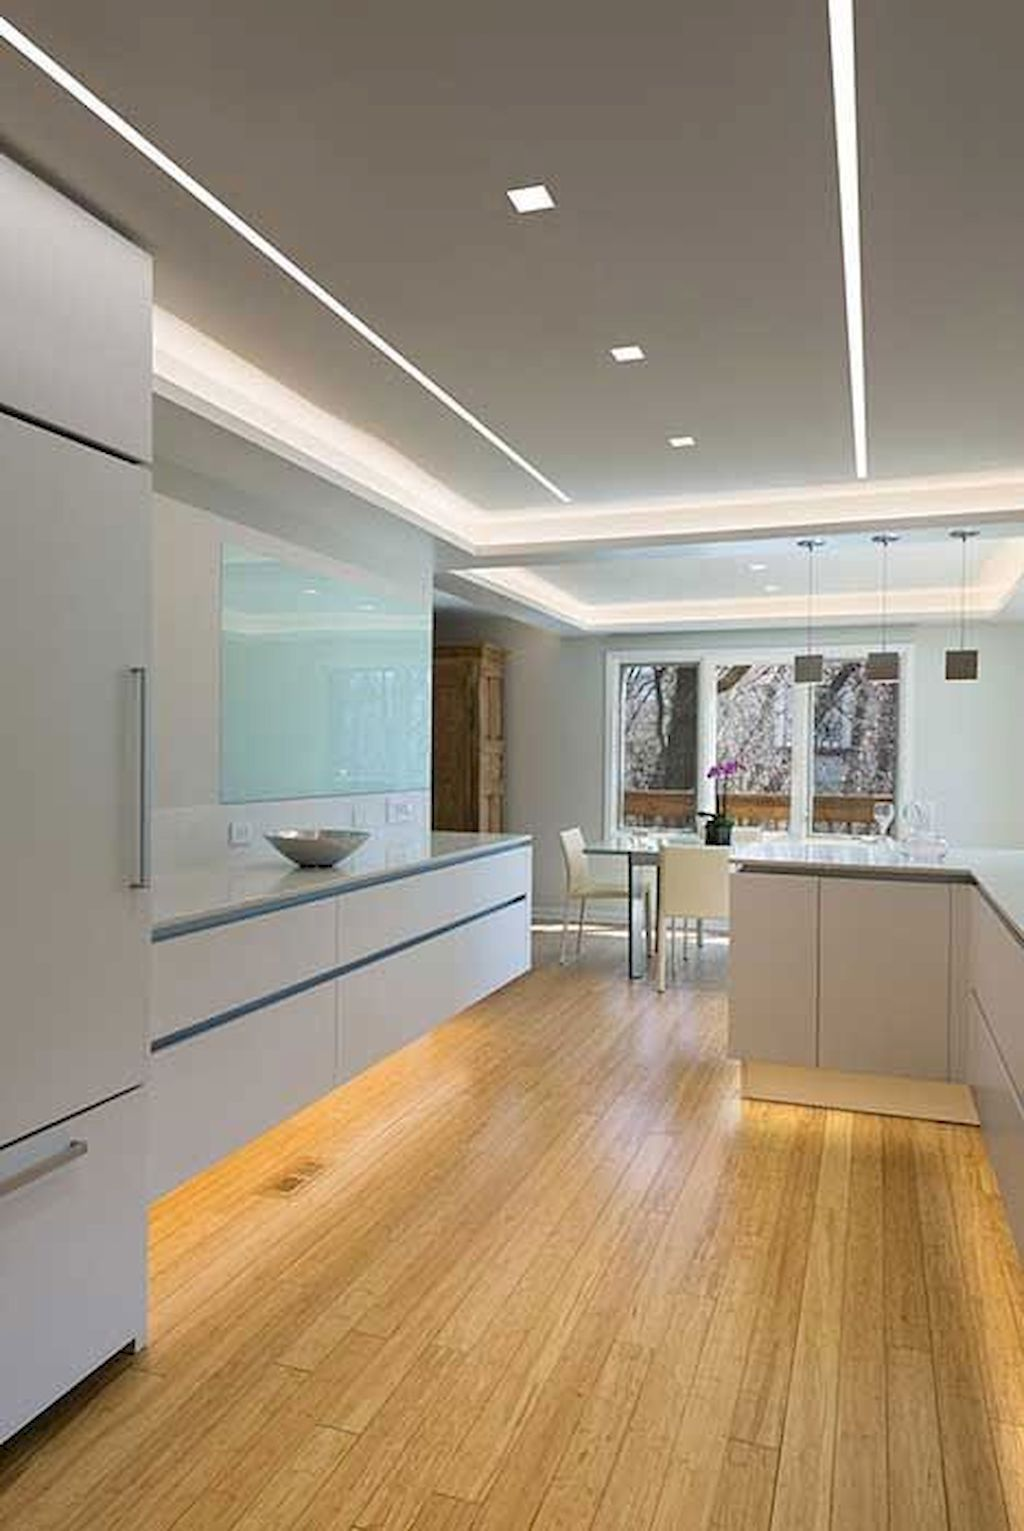 Led Ceiling Light Decoration Ideas For Home Illuminazione